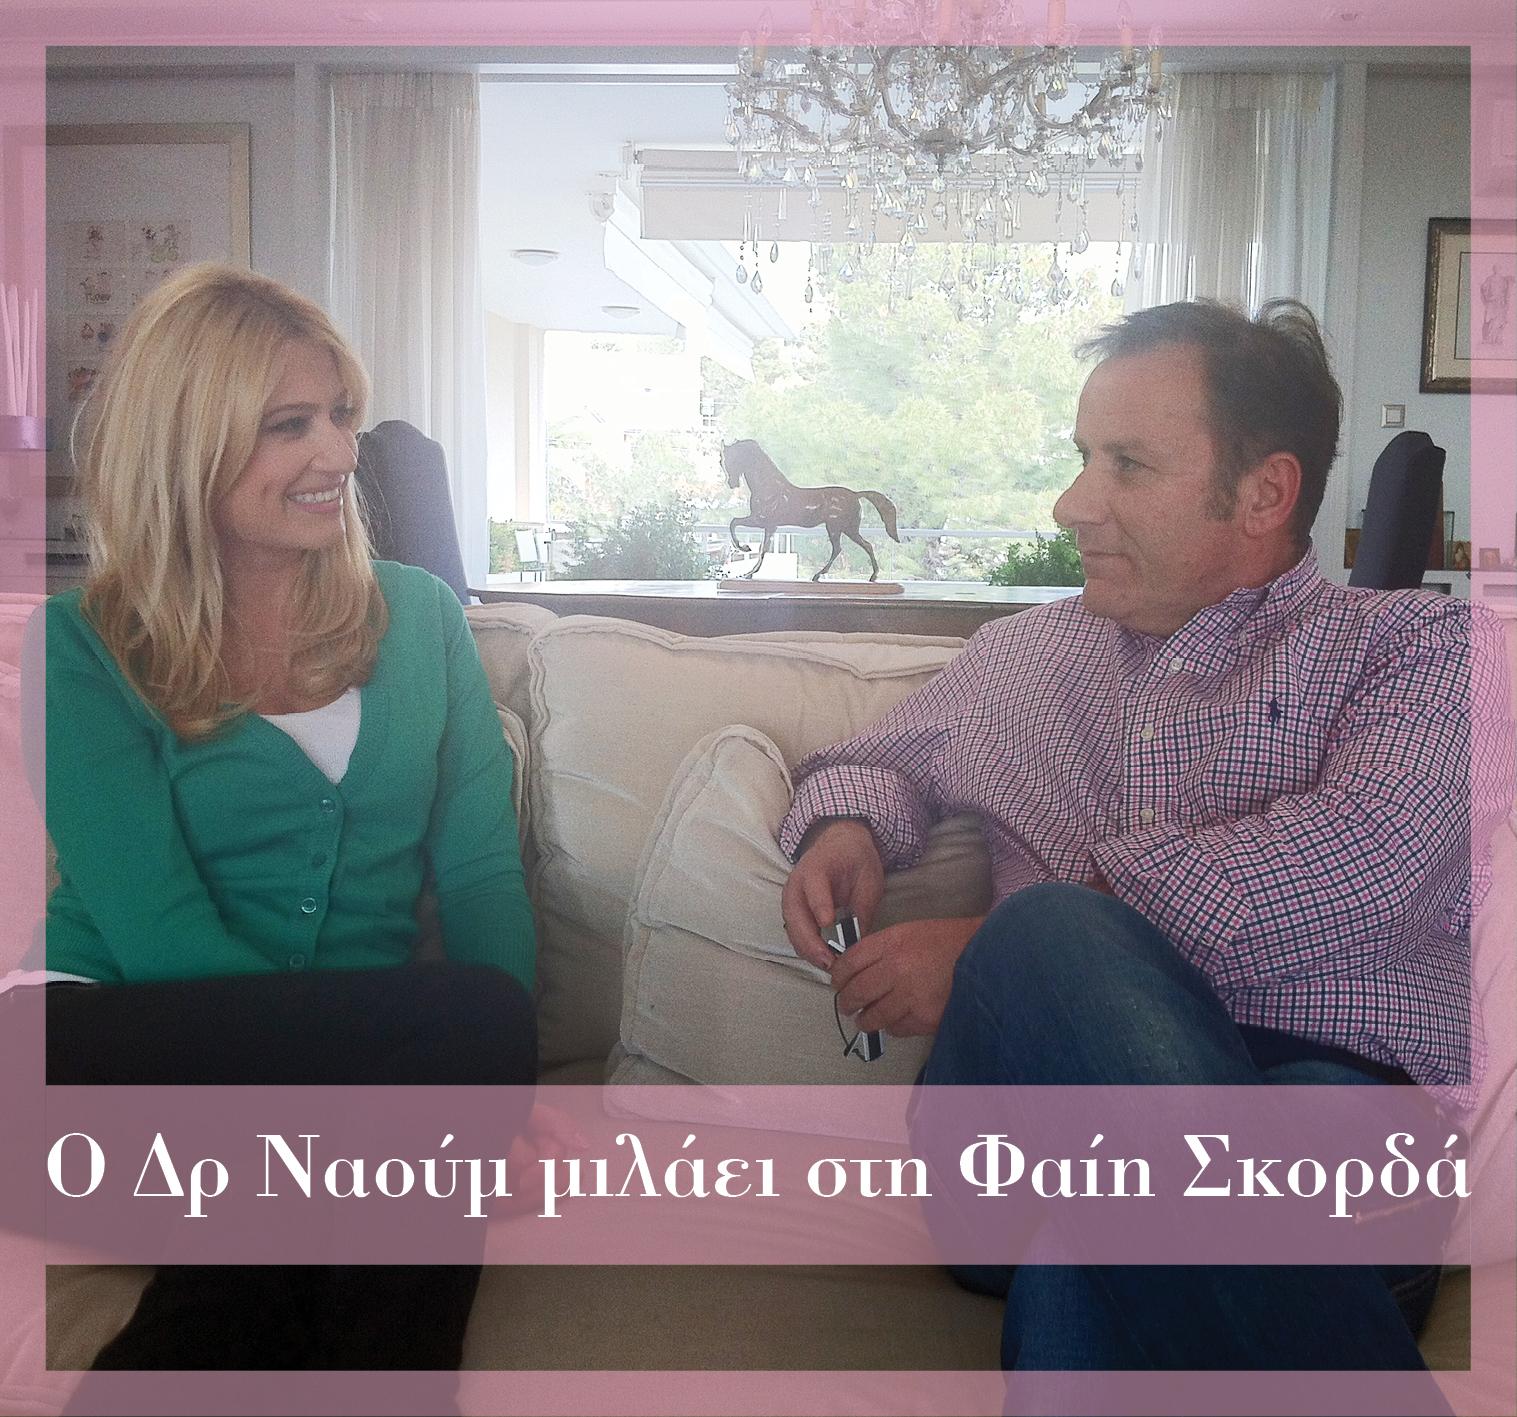 O Dr. Ναούμ μιλάει στη Φαίη Σκορδά